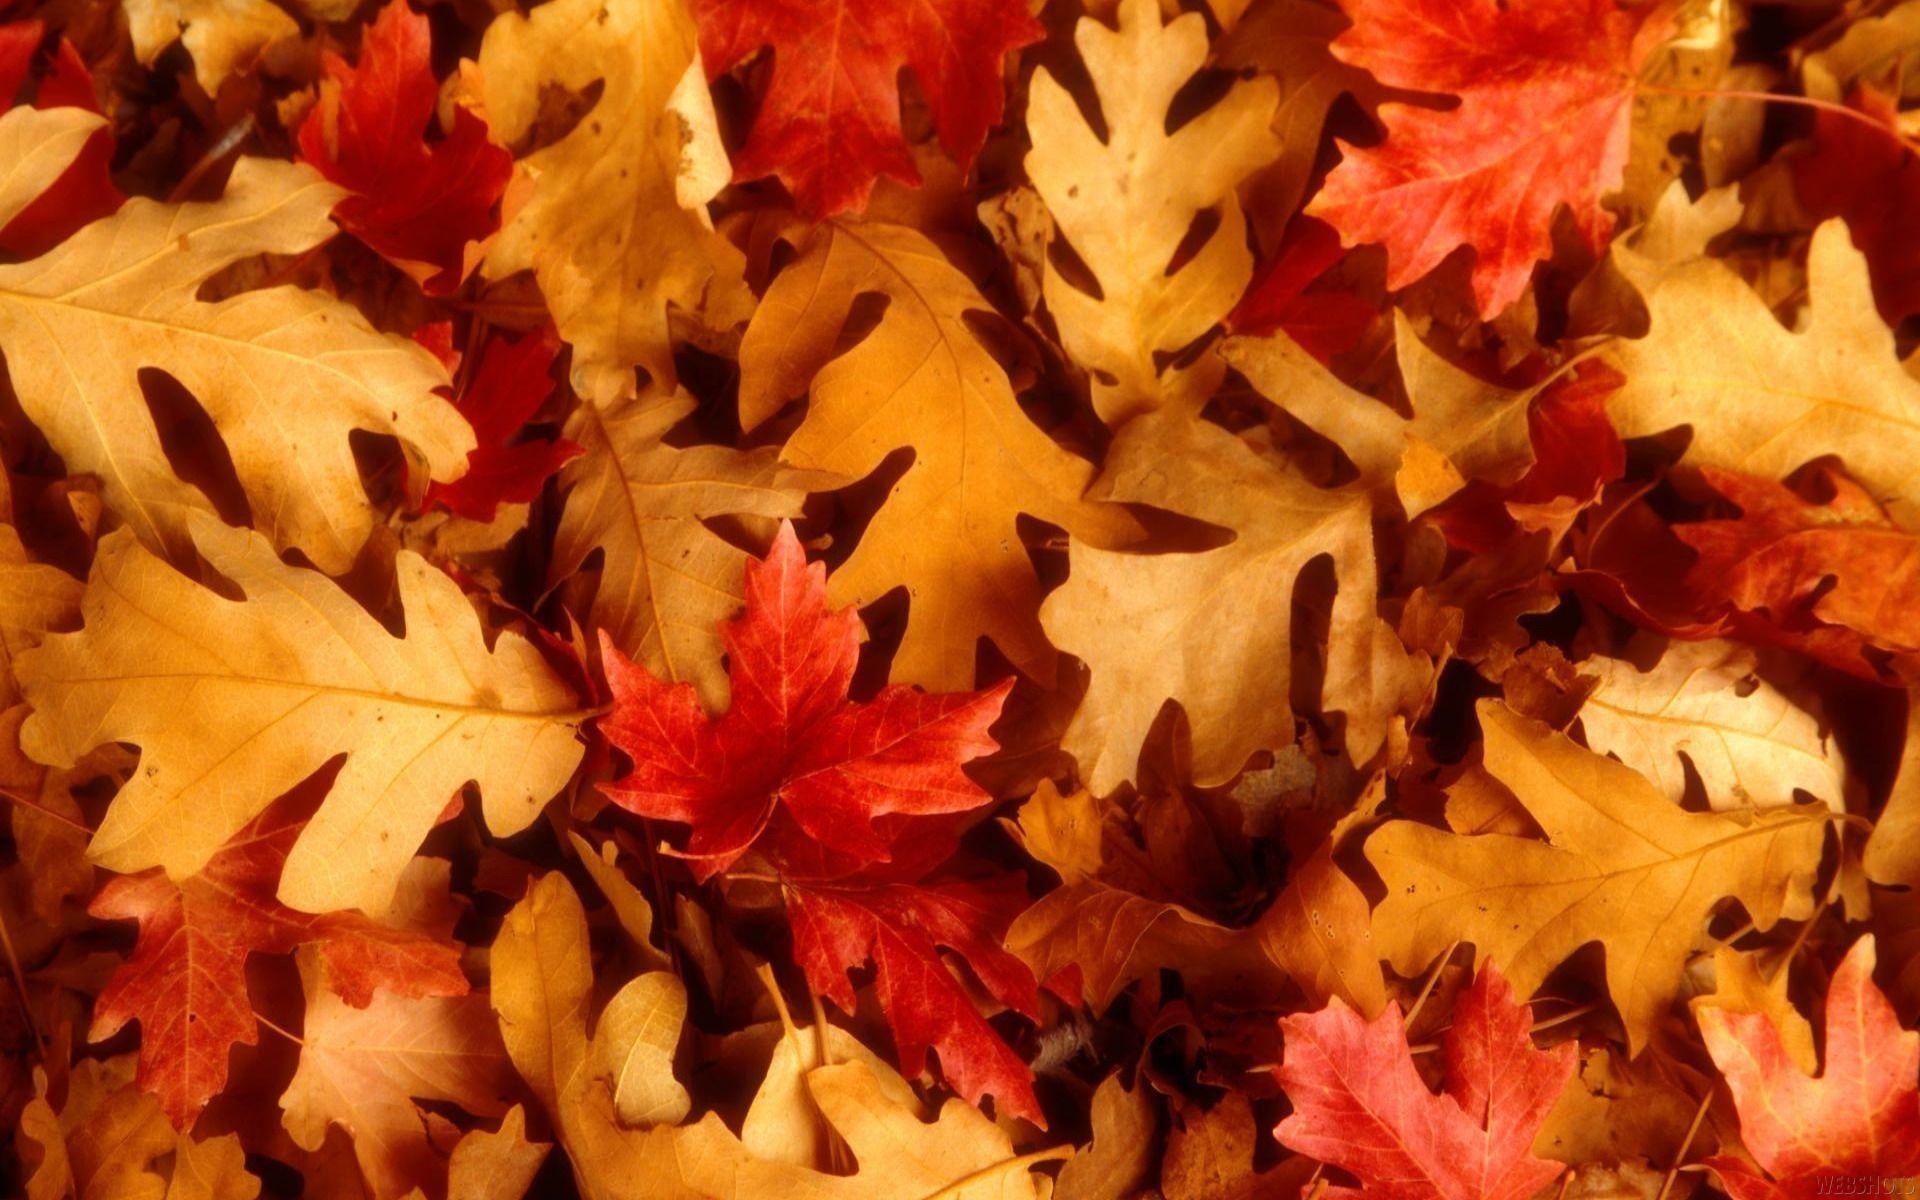 Fall Foliage Wallpaper 1920x1080 Fall Leaf Background 183 ①